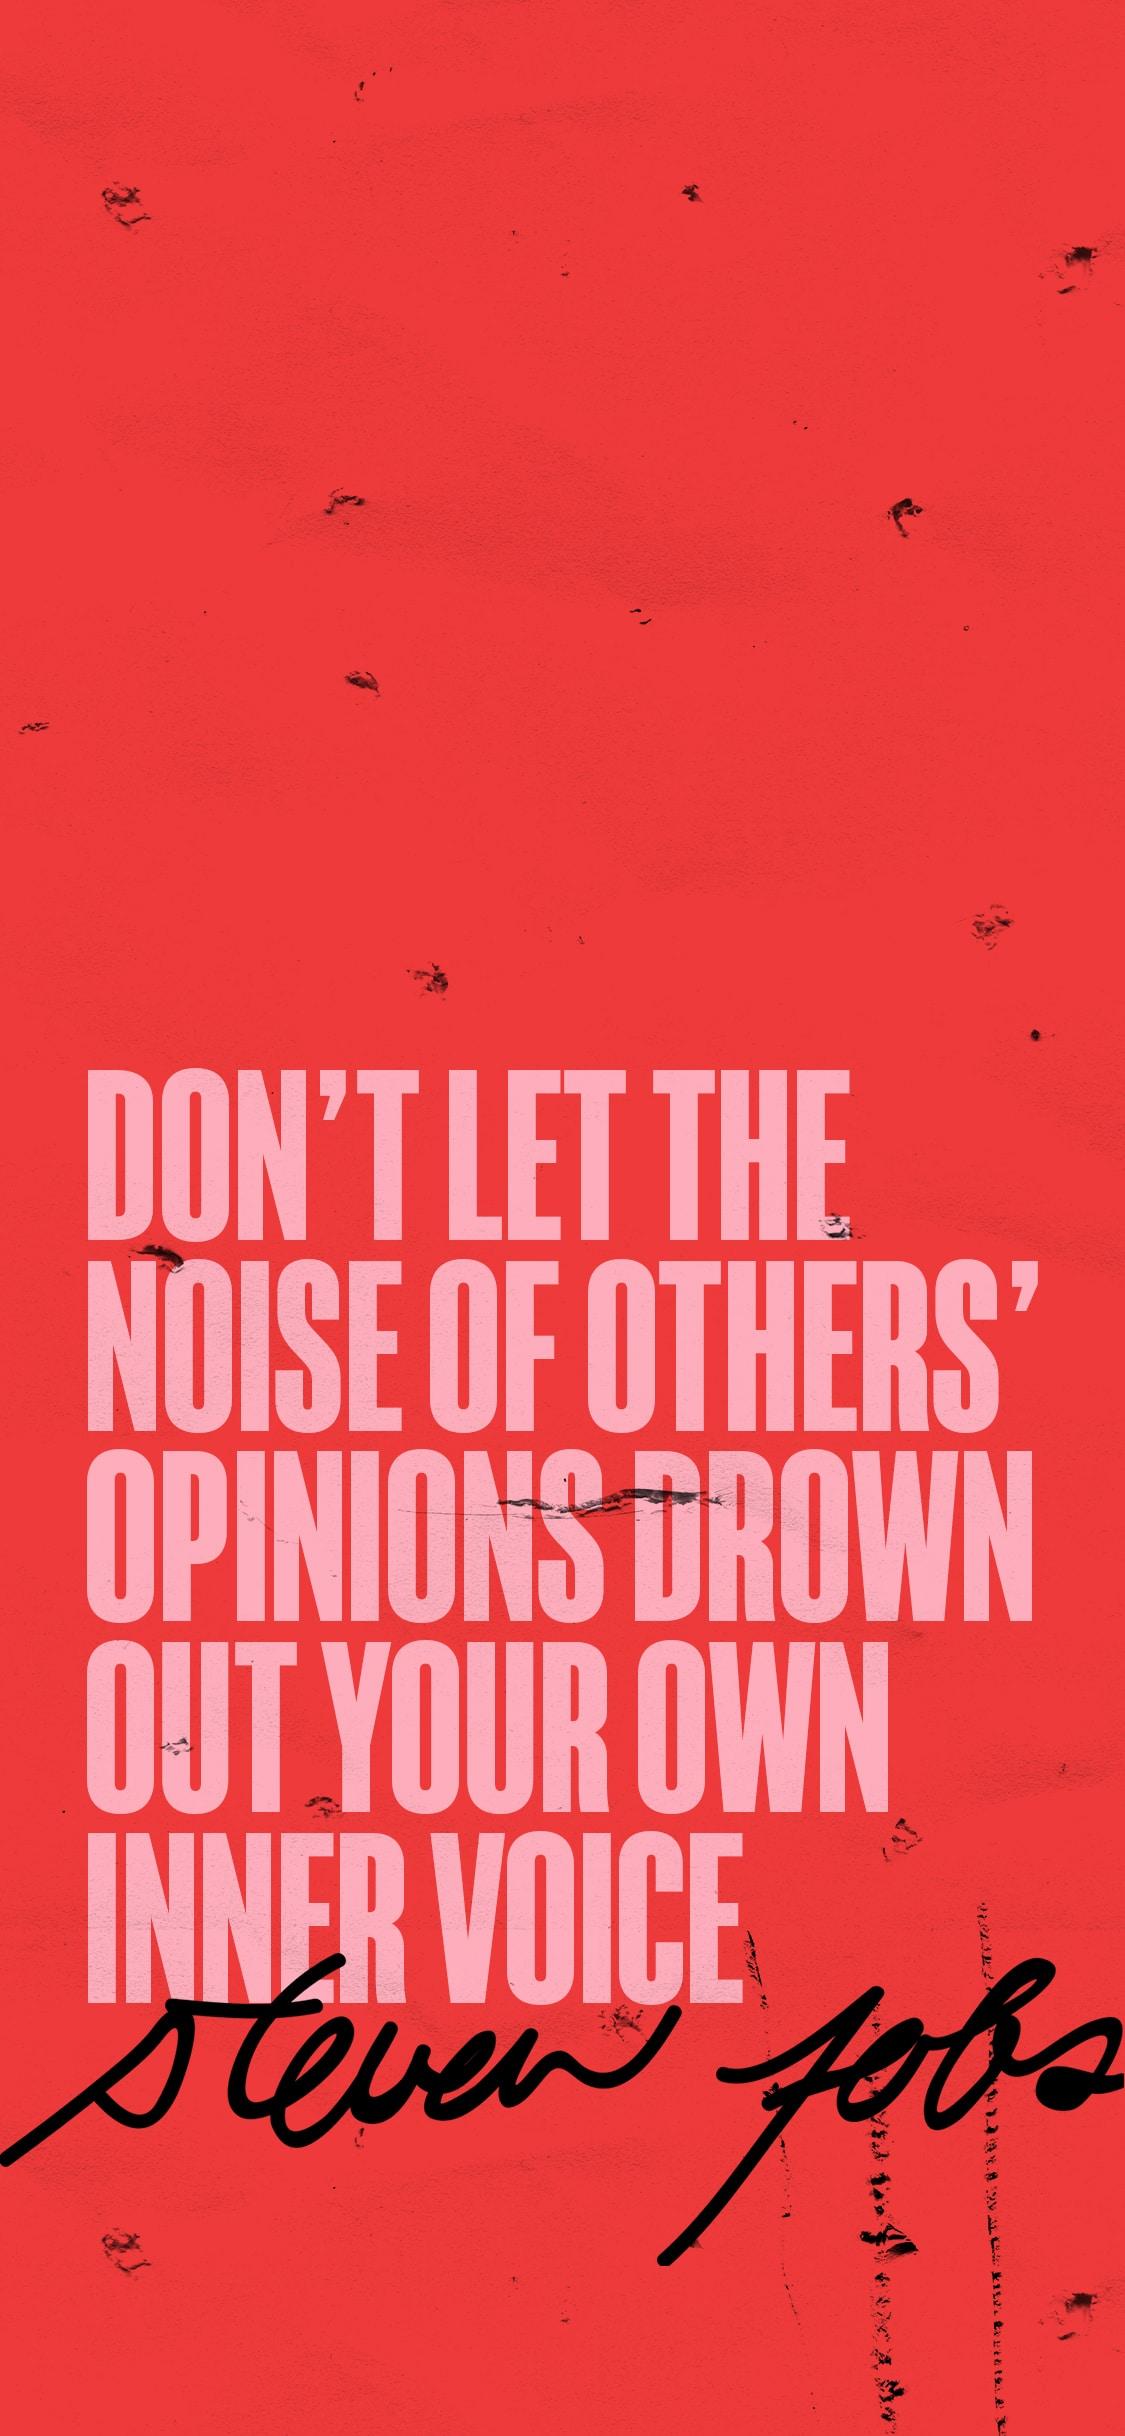 Steve Jobs Inspiring quote 10